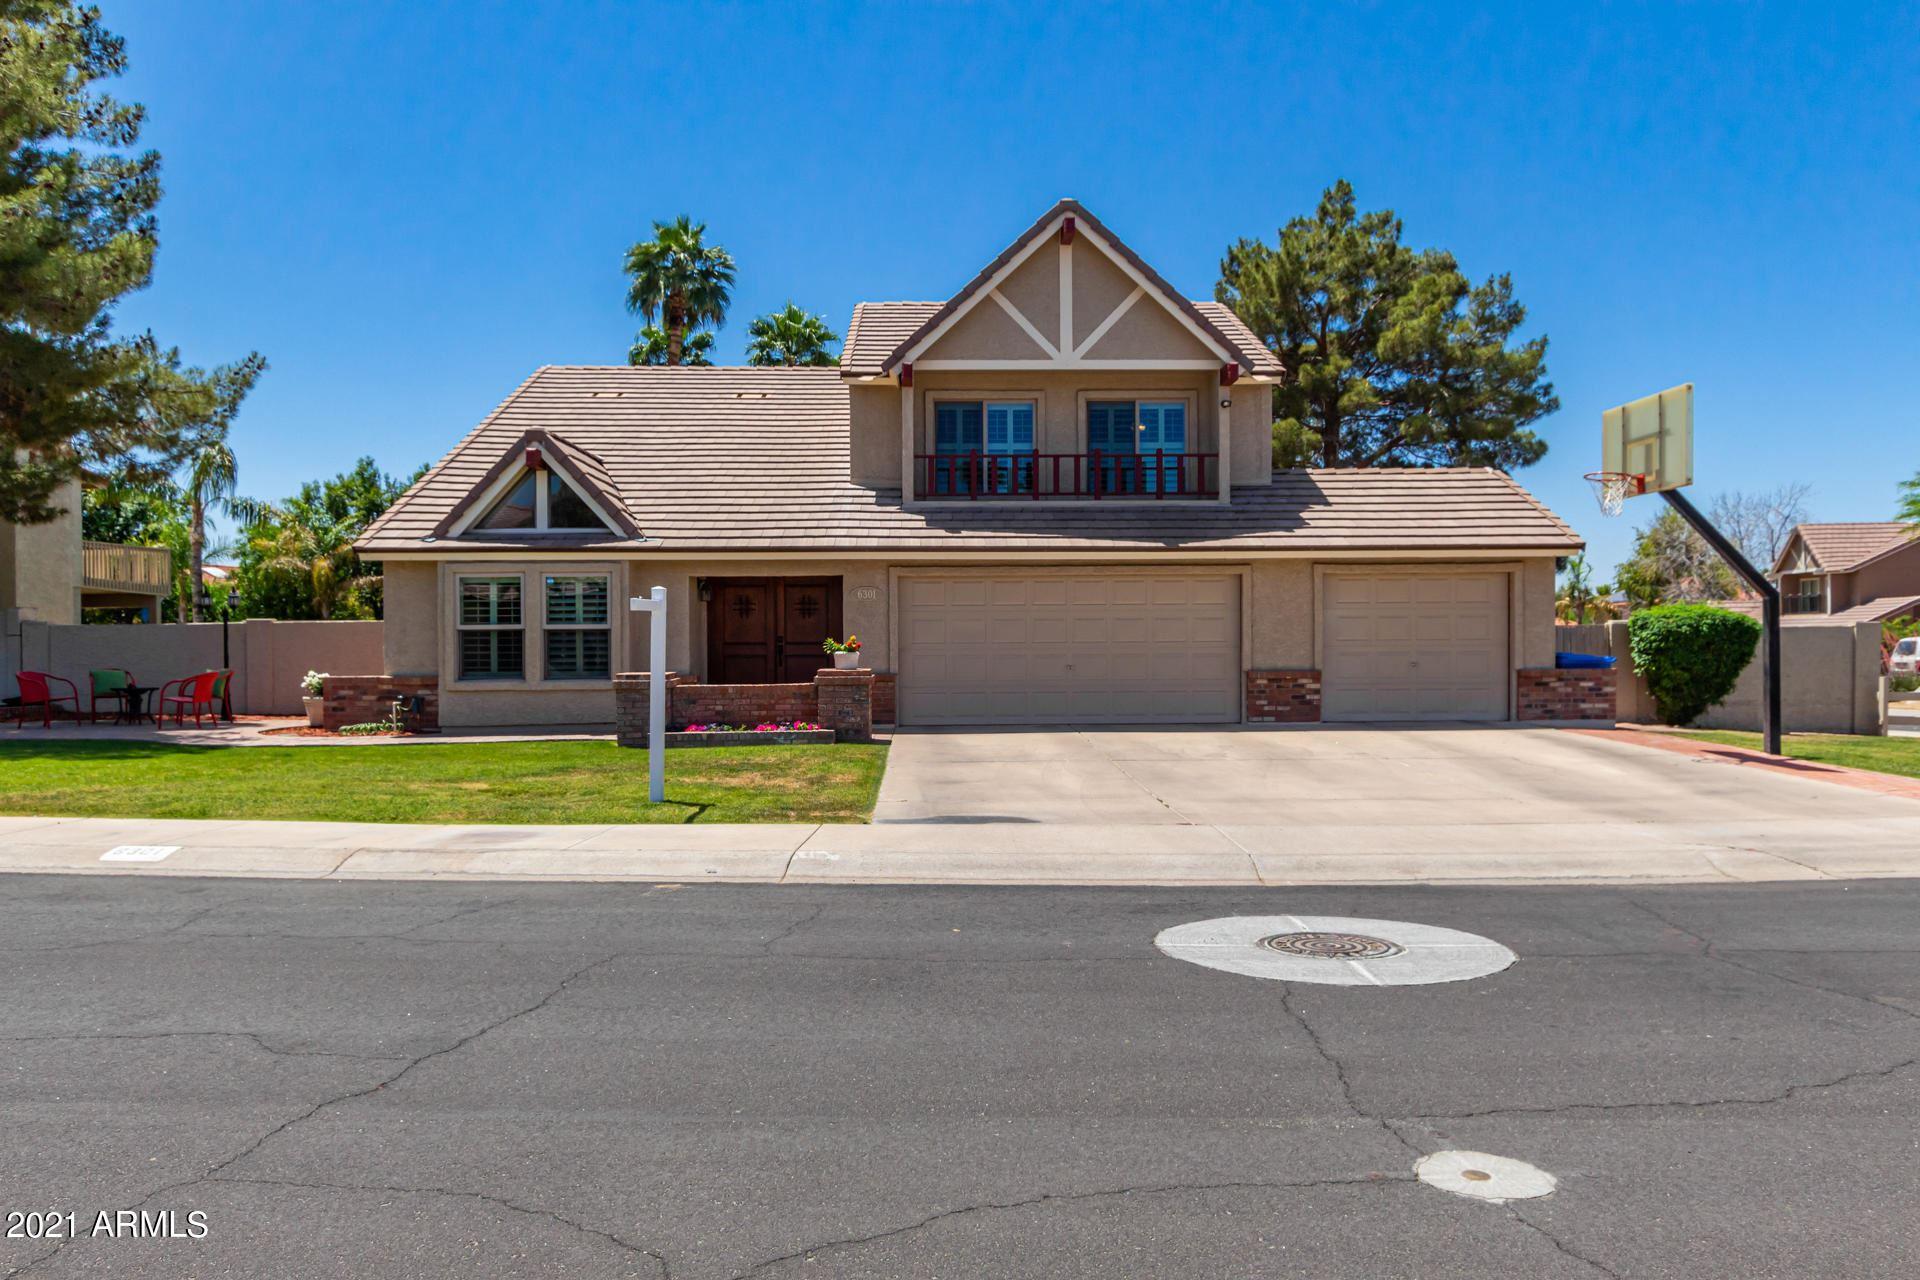 6301 E MONTREAL Place, Scottsdale, AZ 85254 - MLS#: 6232380